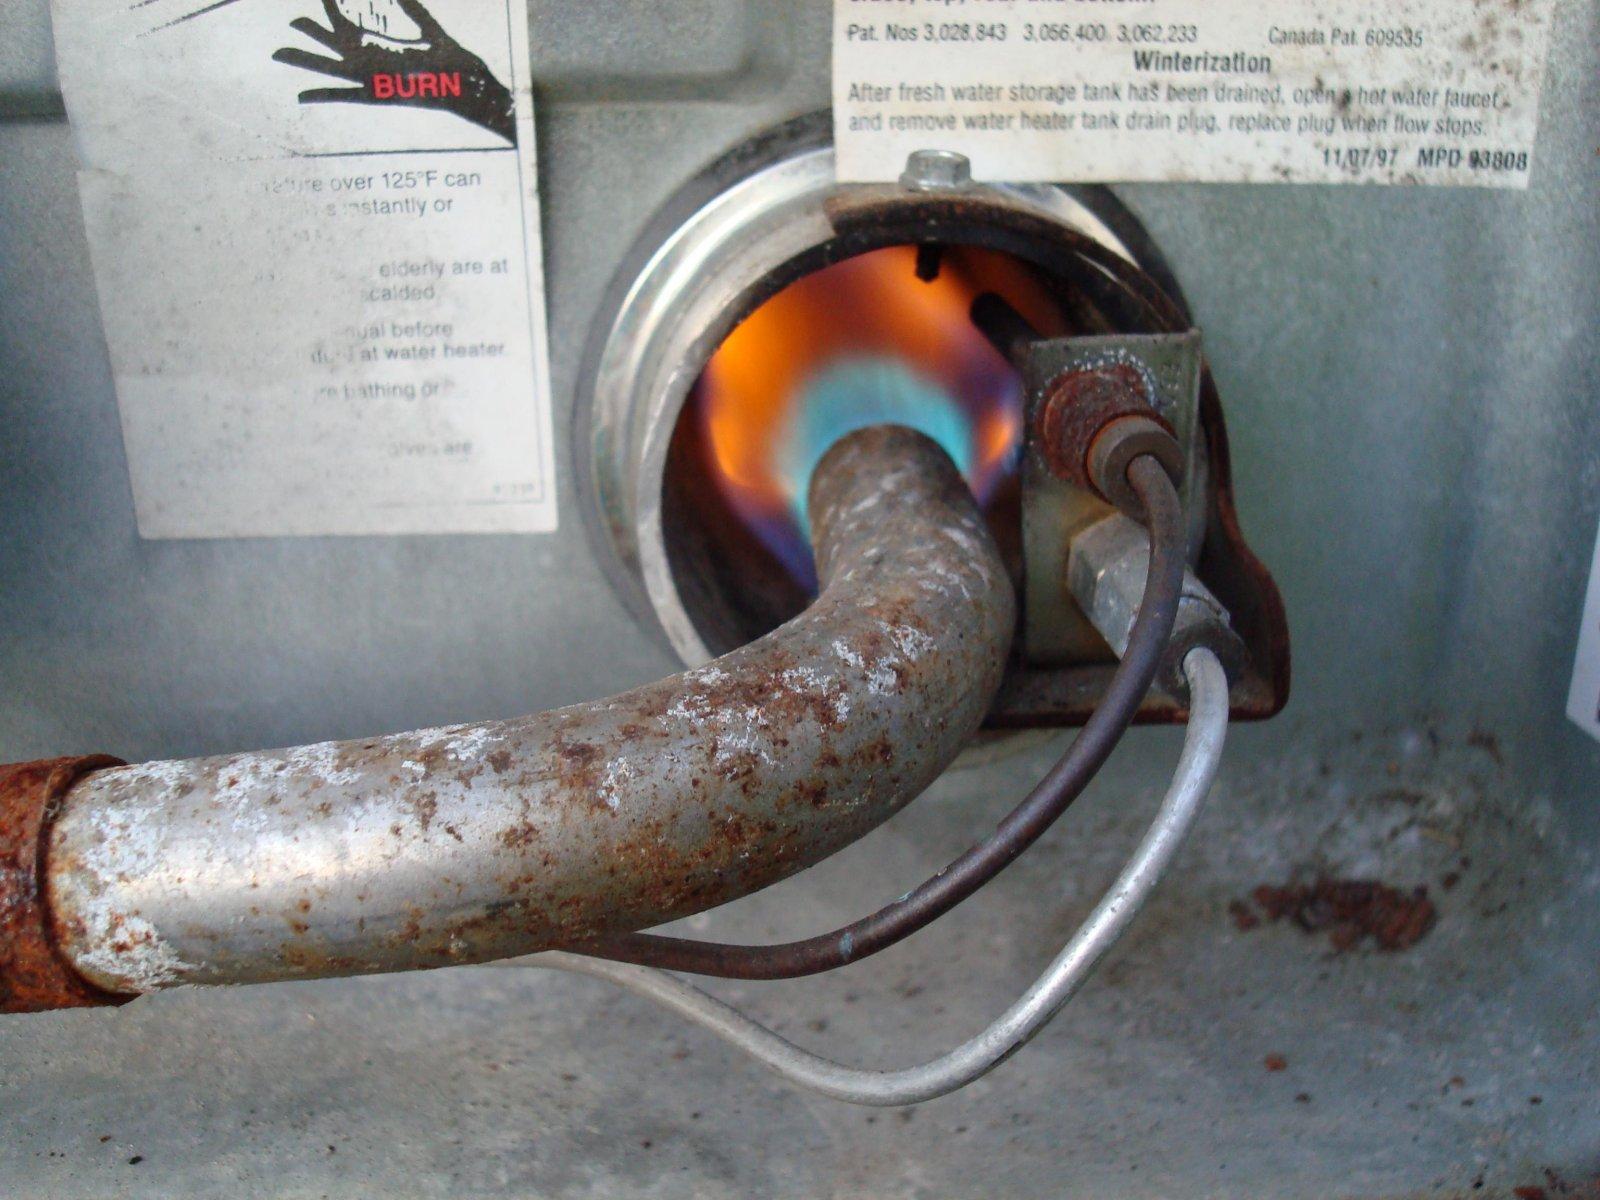 Click image for larger version  Name:burner flame.jpg Views:83 Size:248.9 KB ID:86856